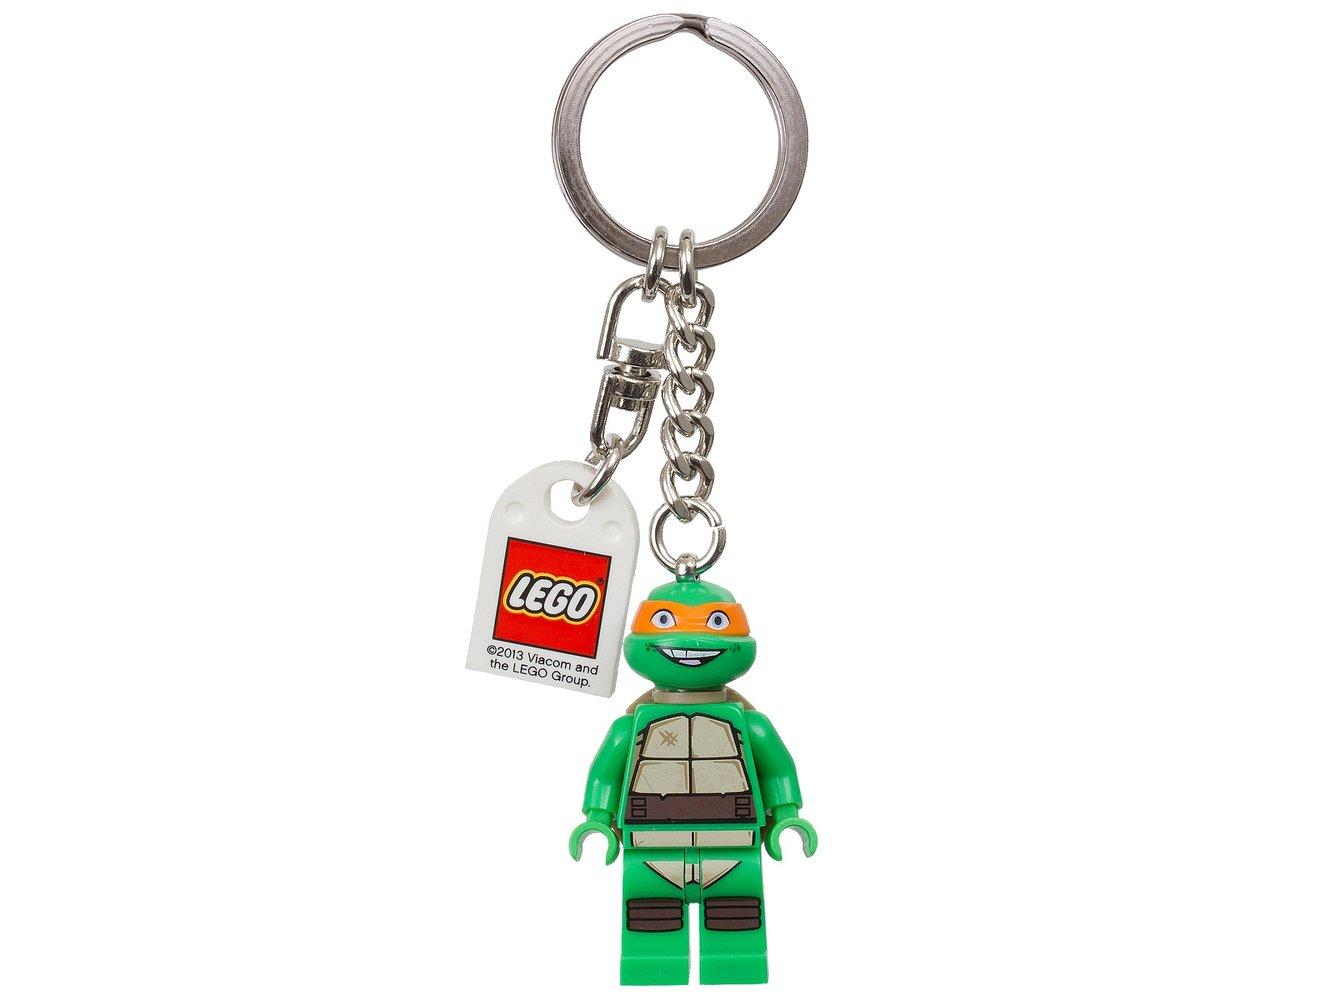 Michelangelo Key Chain